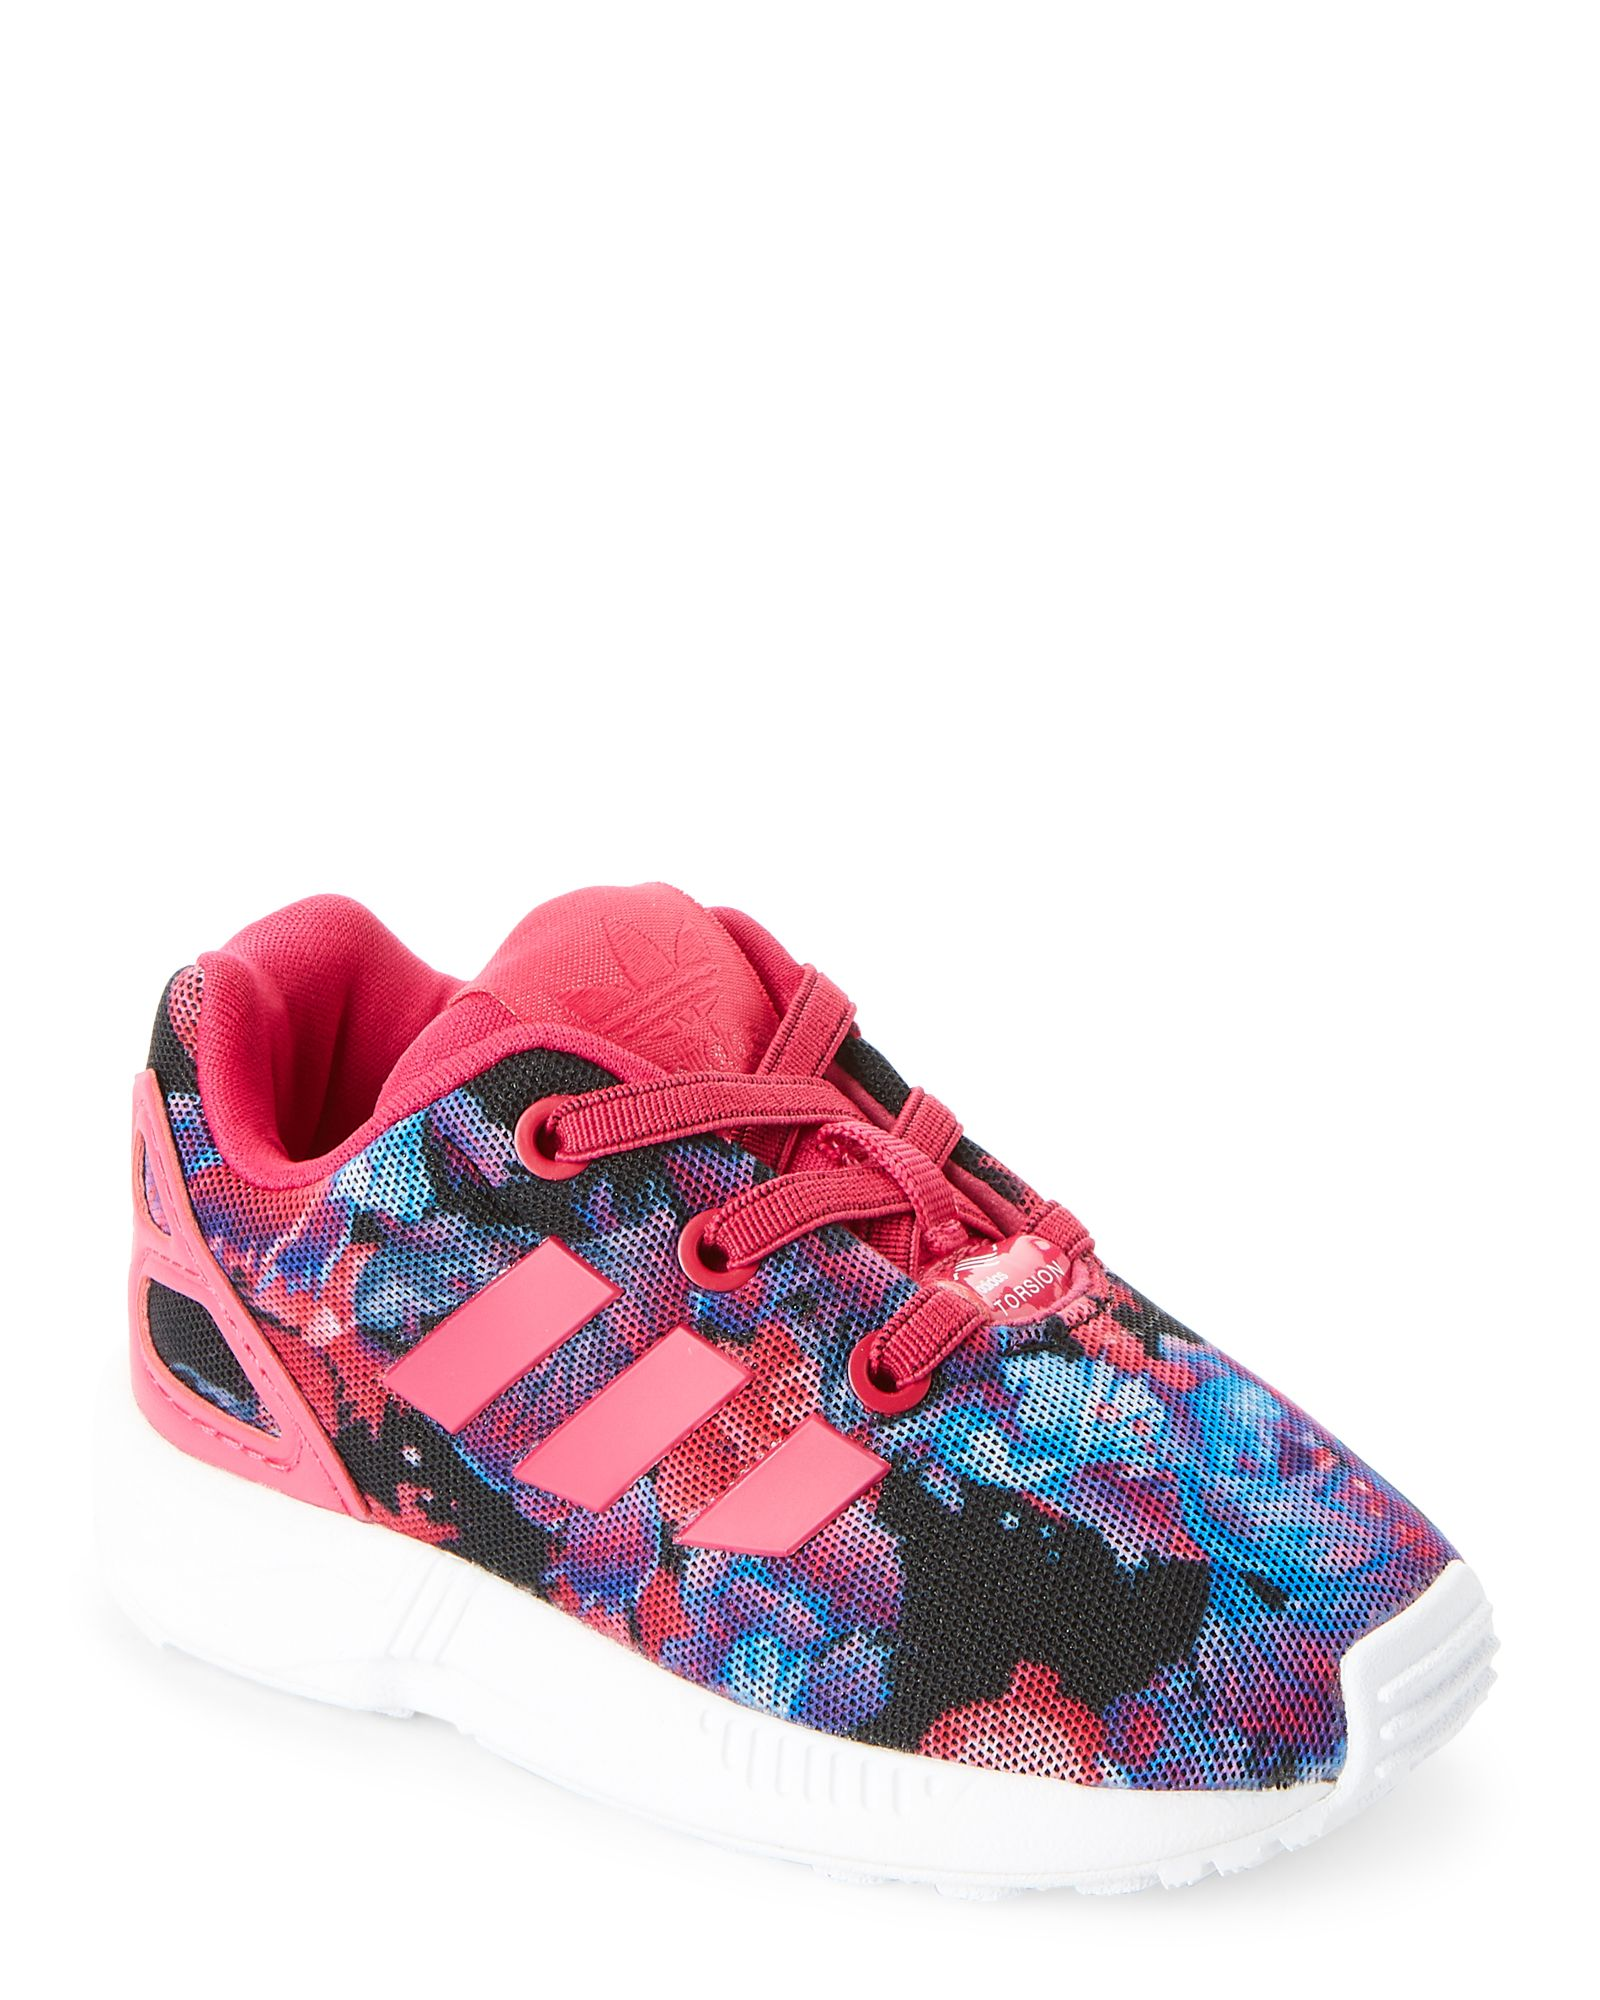 9ec7fd66a8c18 Adidas (Toddler Girls) Bo Pink ZX Flux Sneakers